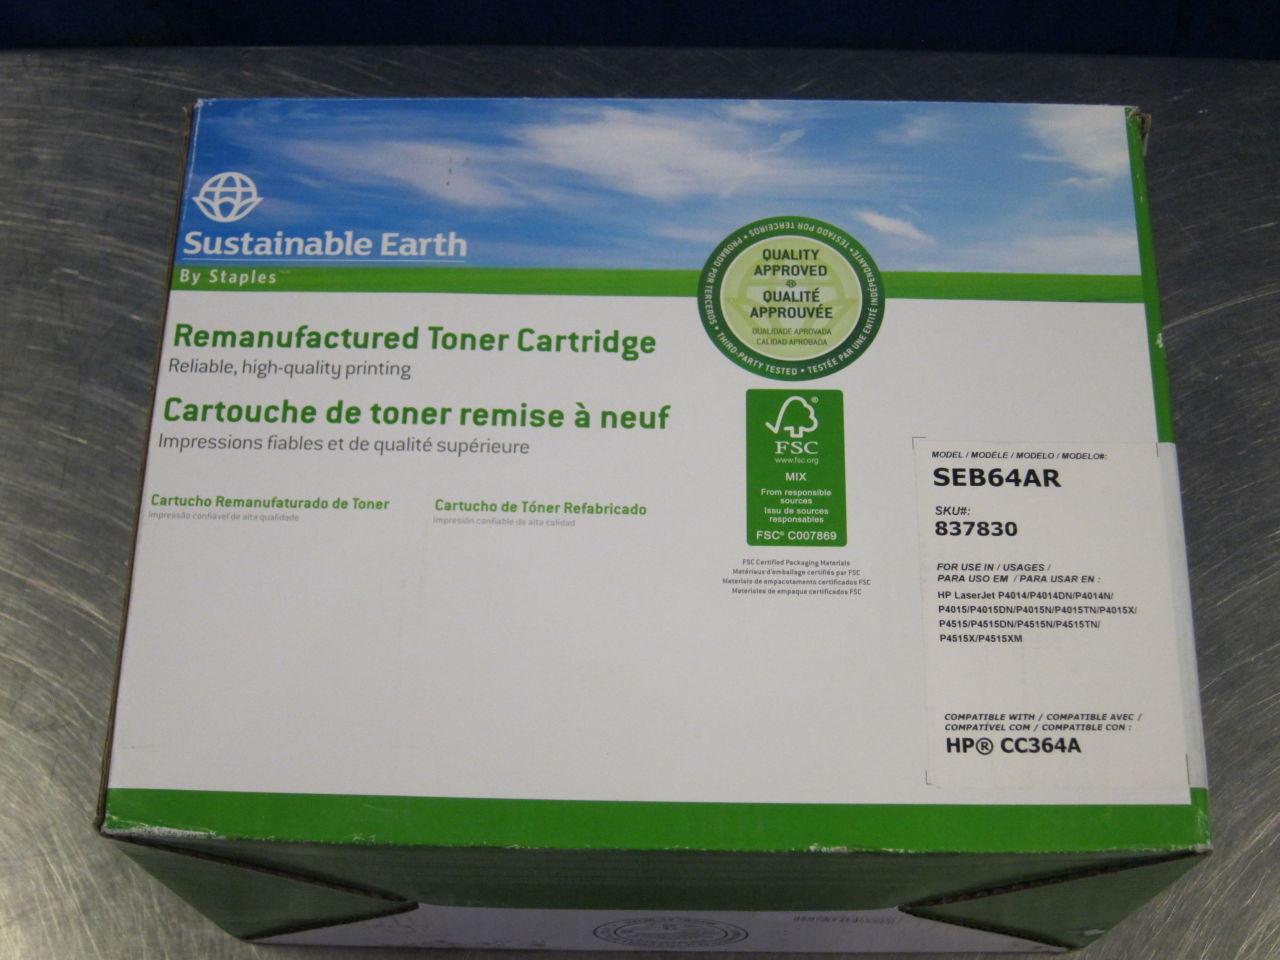 STAPLES/SUSTAINABLE EARTH SEB64AR Toner Cartridges